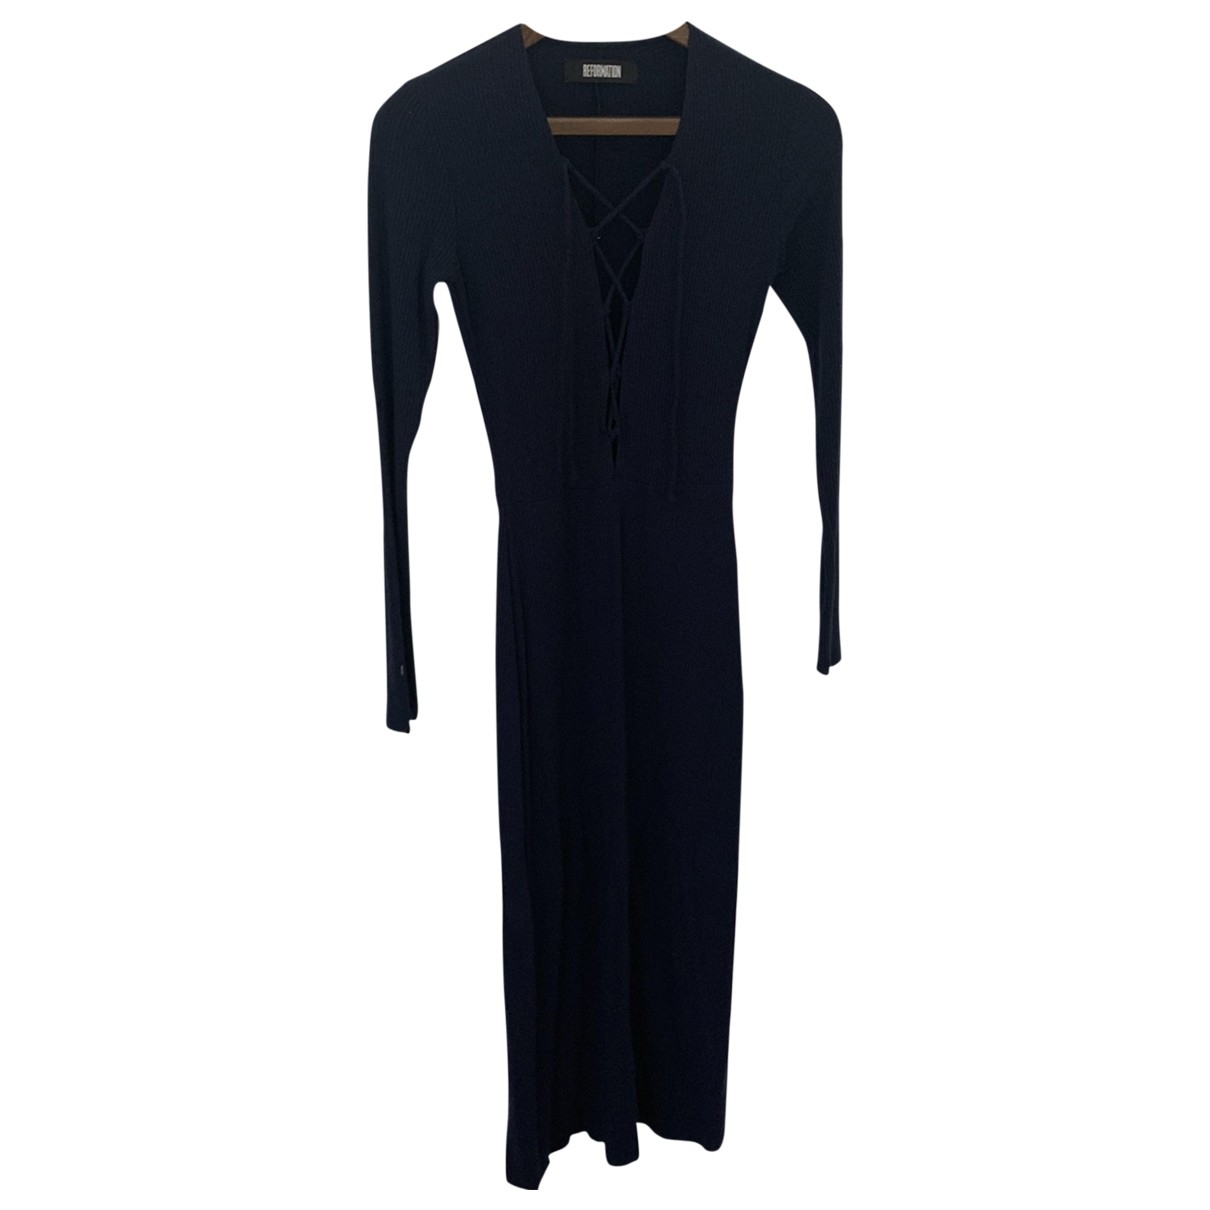 Reformation \N Navy dress for Women S International